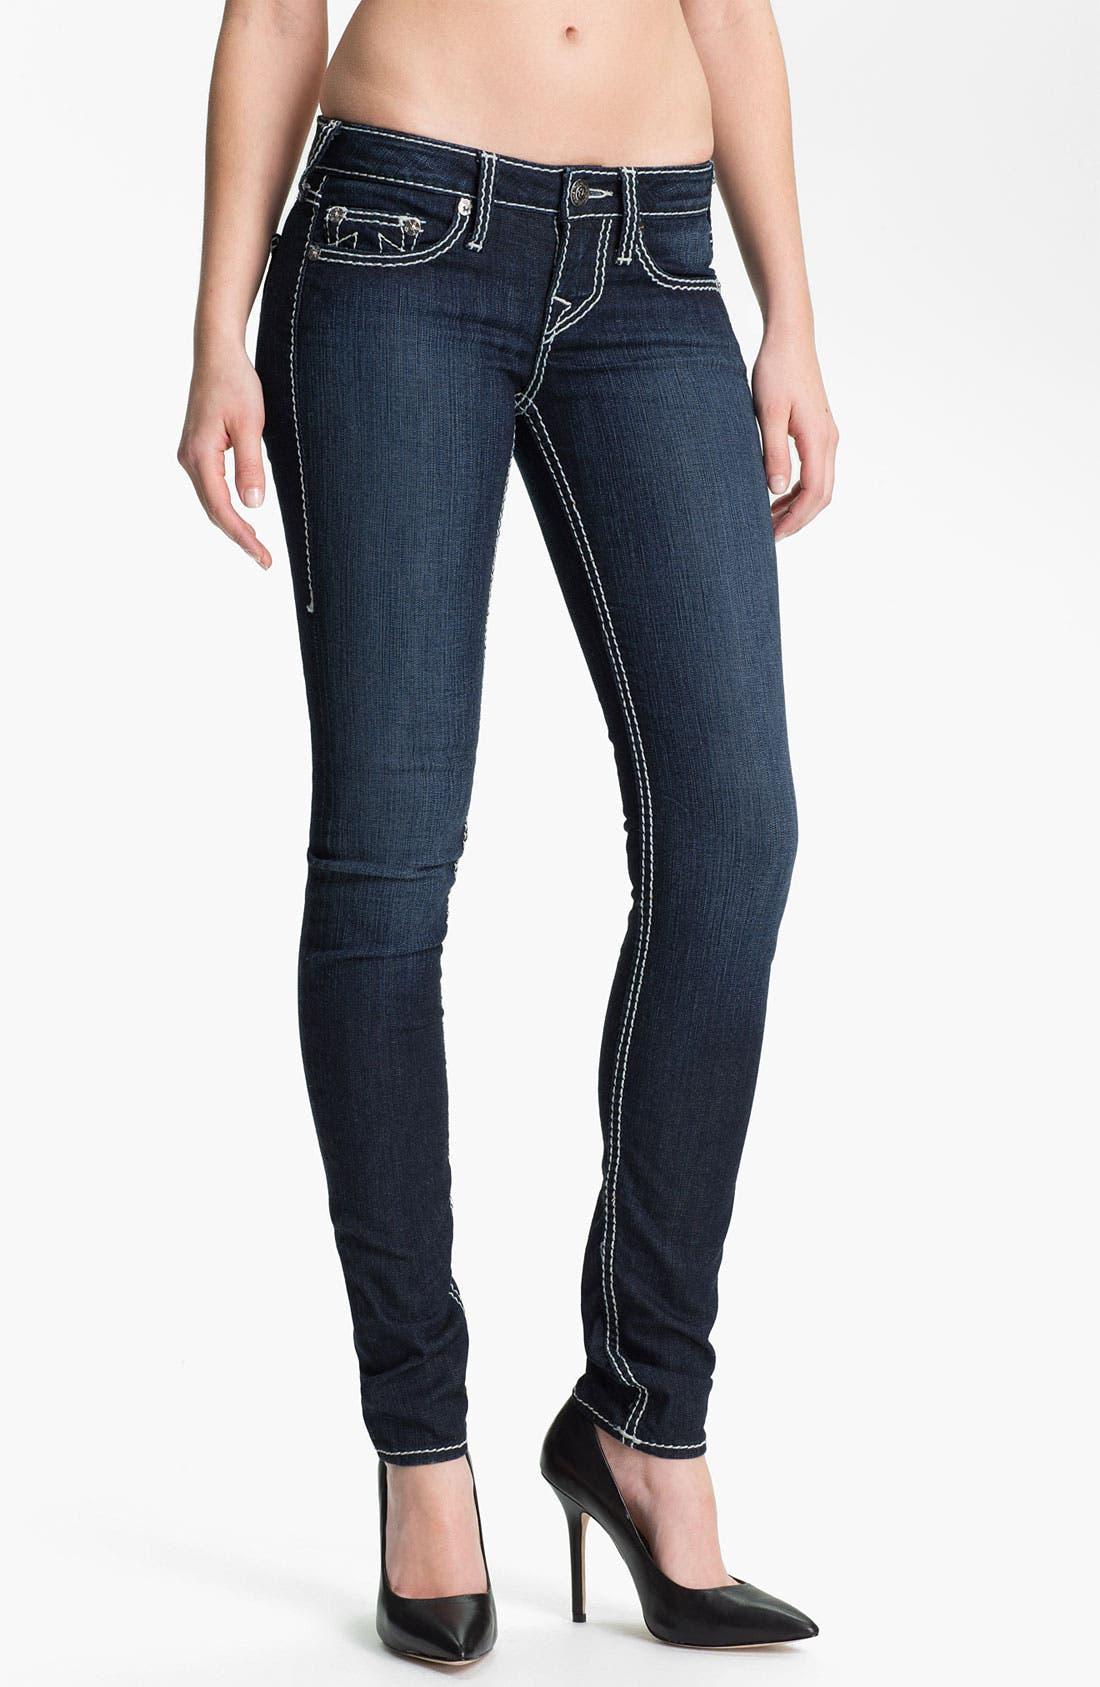 Main Image - True Religion Brand Jeans 'Stella' Skinny Stretch Jeans (Lonestar)